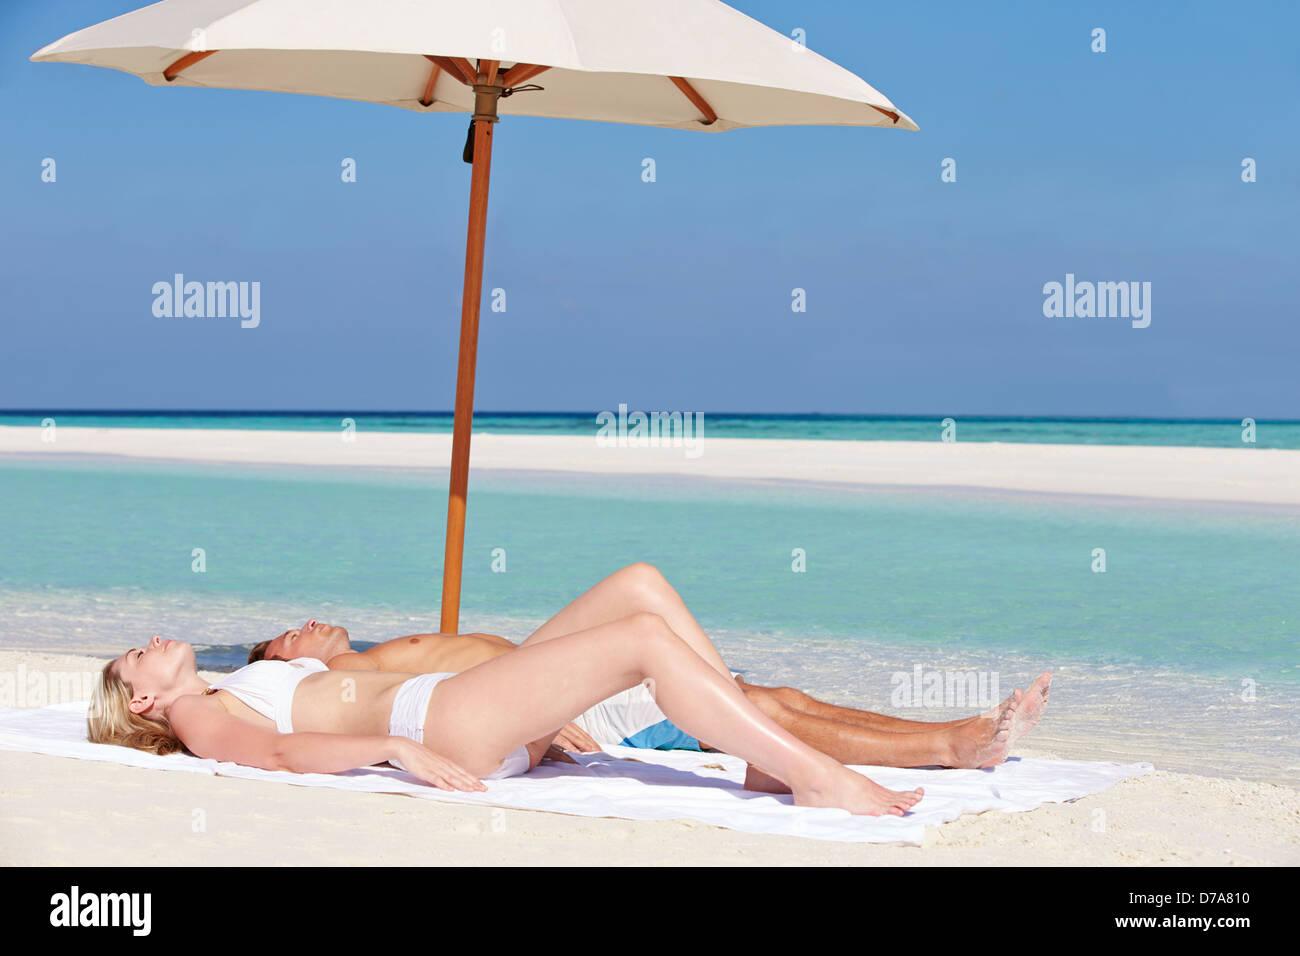 Couple Sunbathing On Beautiful Beach Holiday - Stock Image